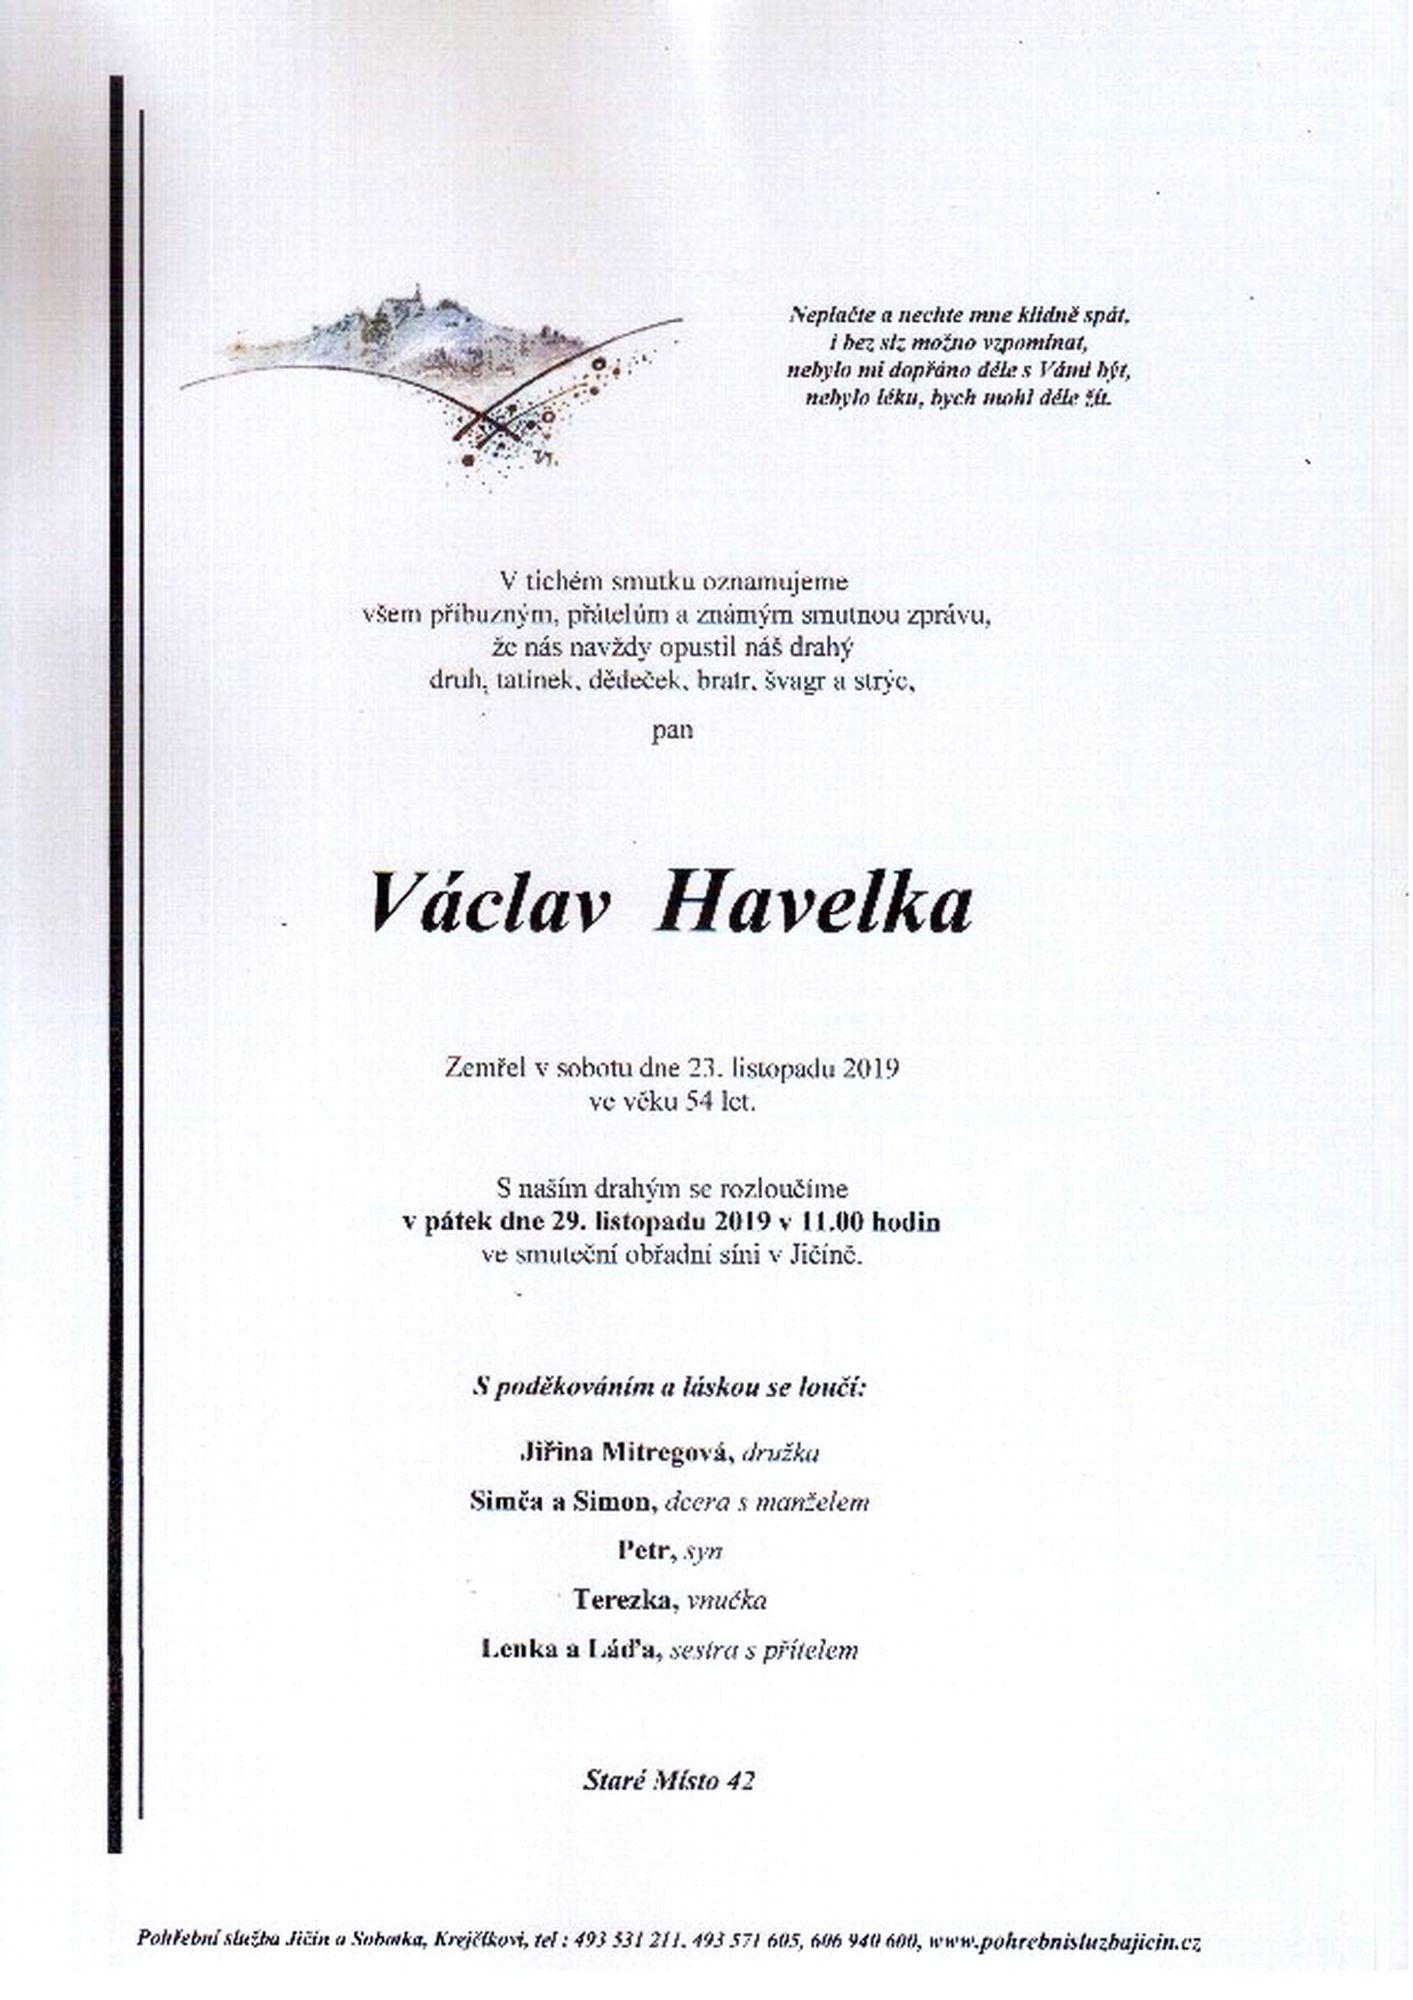 Václav Havelka